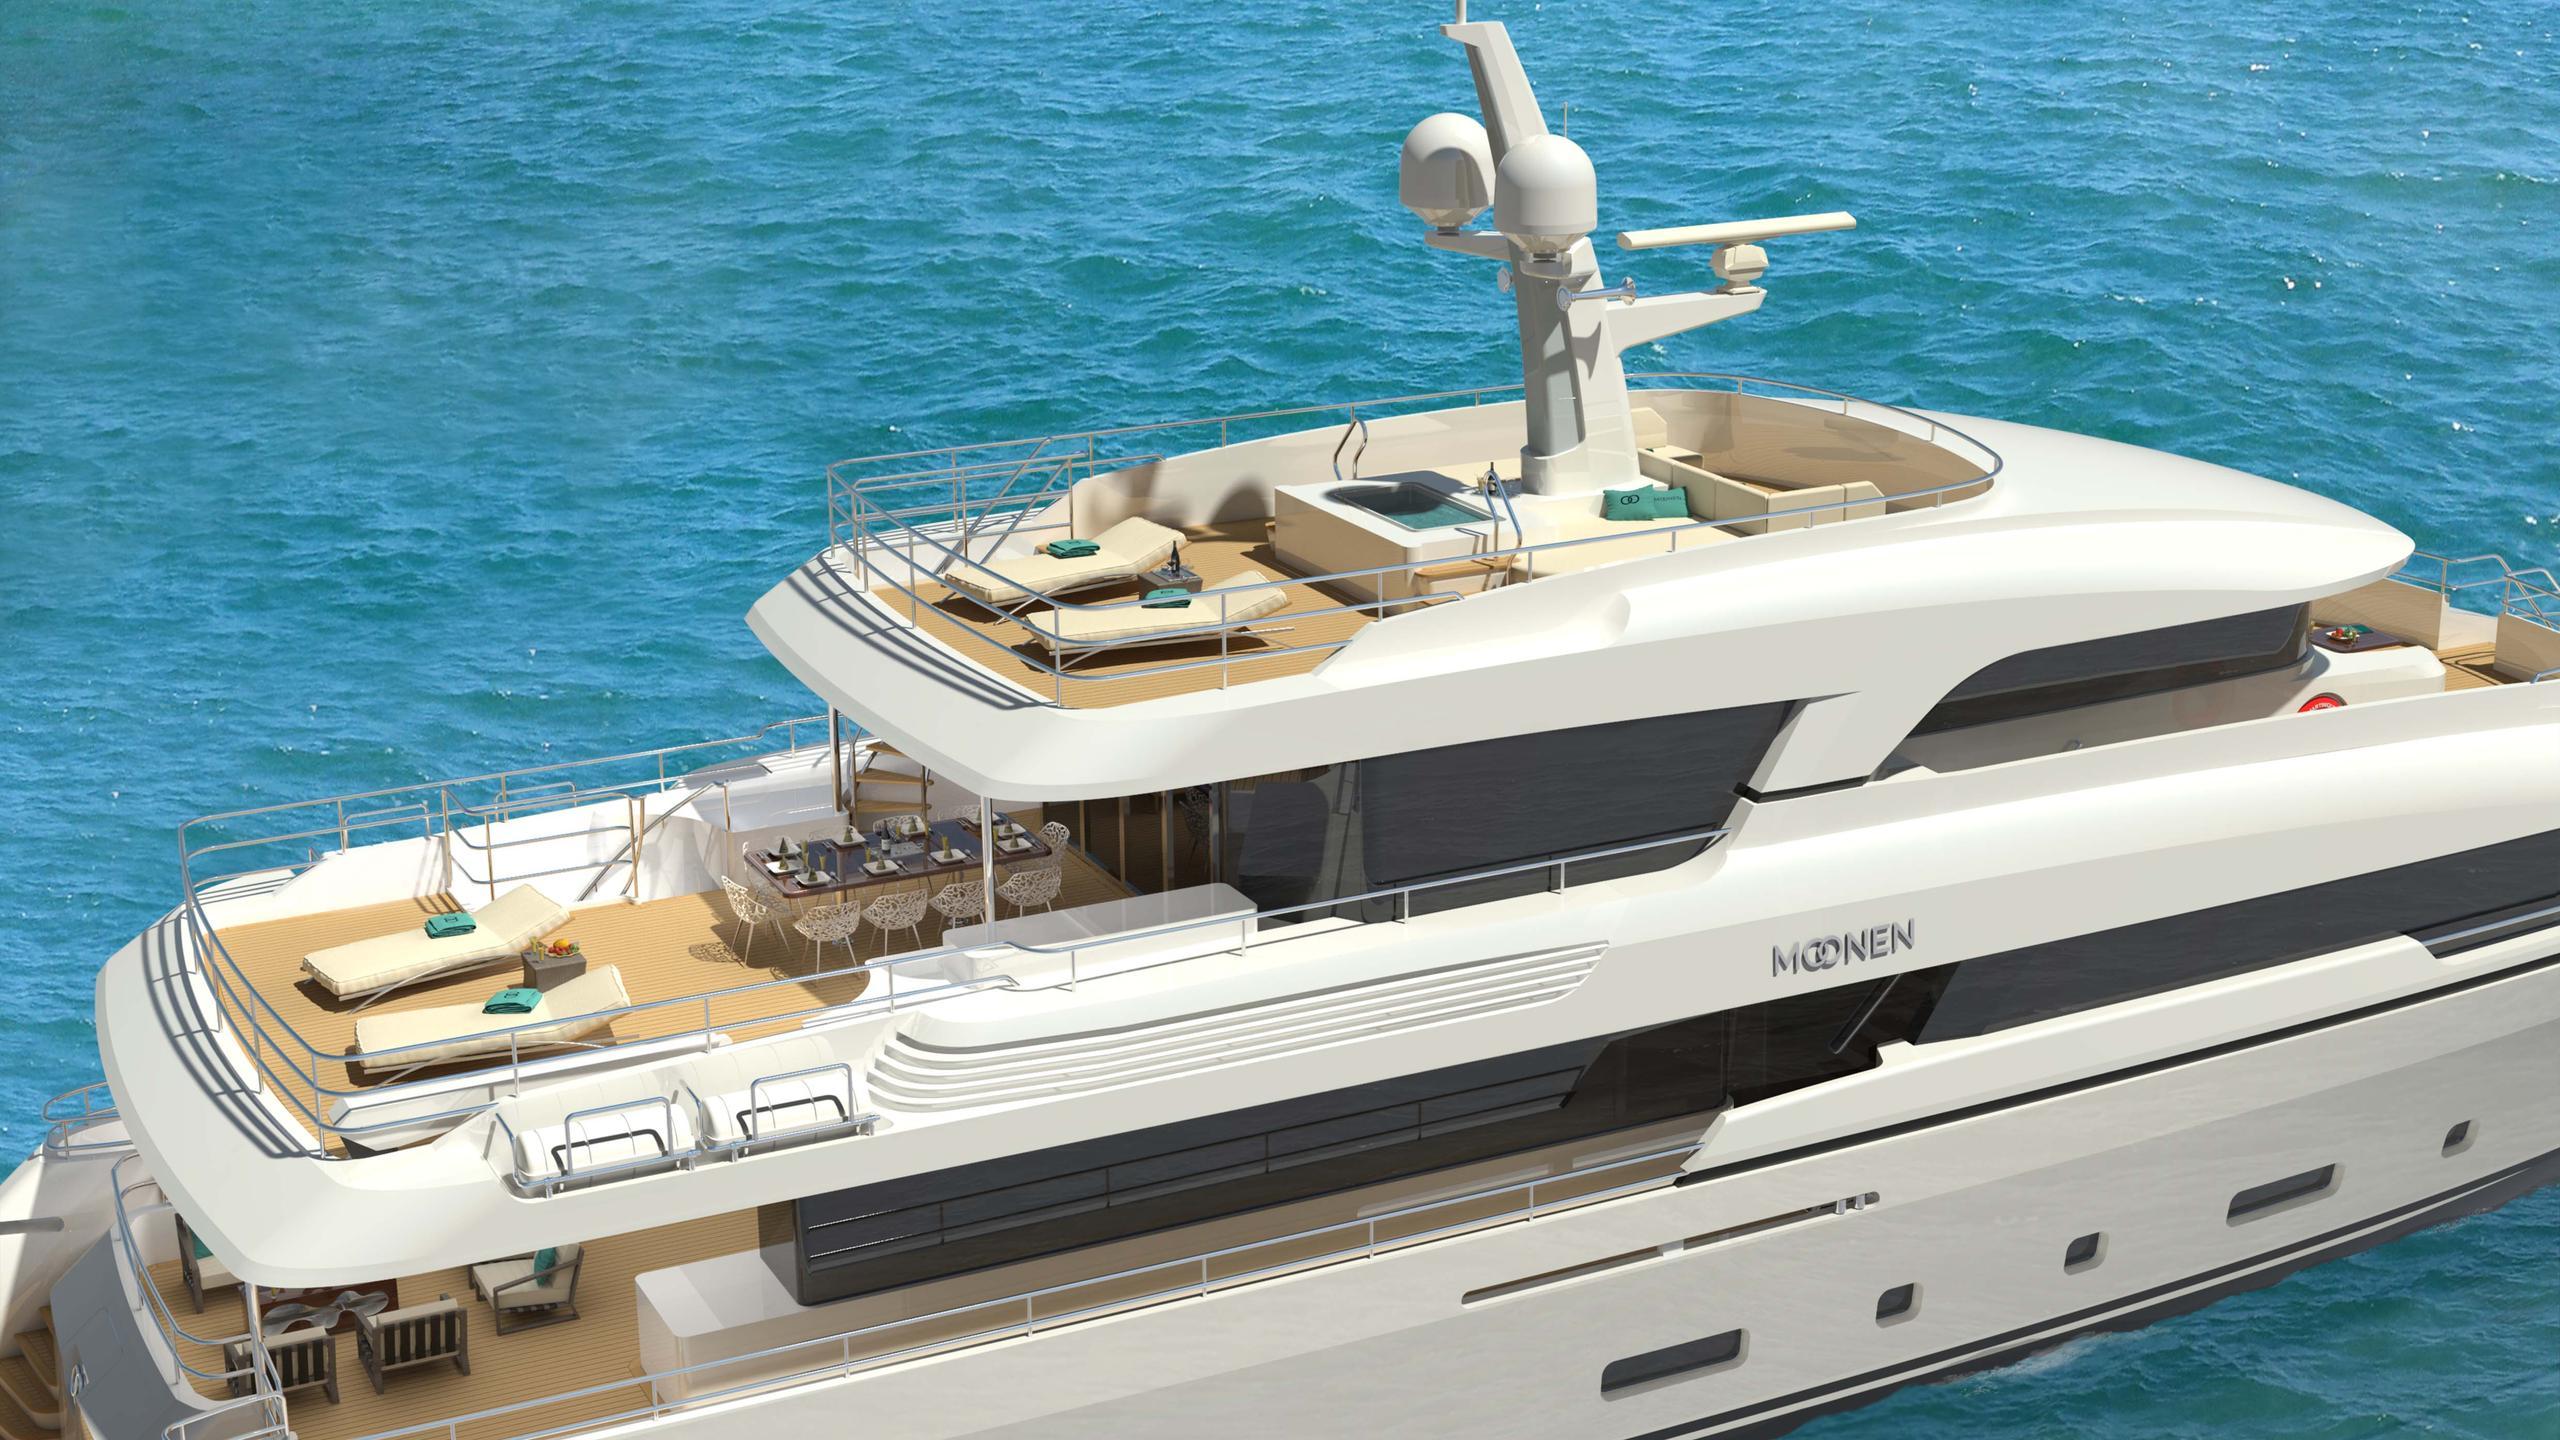 martinique motoryacht moonen 2018 36m rendering aerial decks